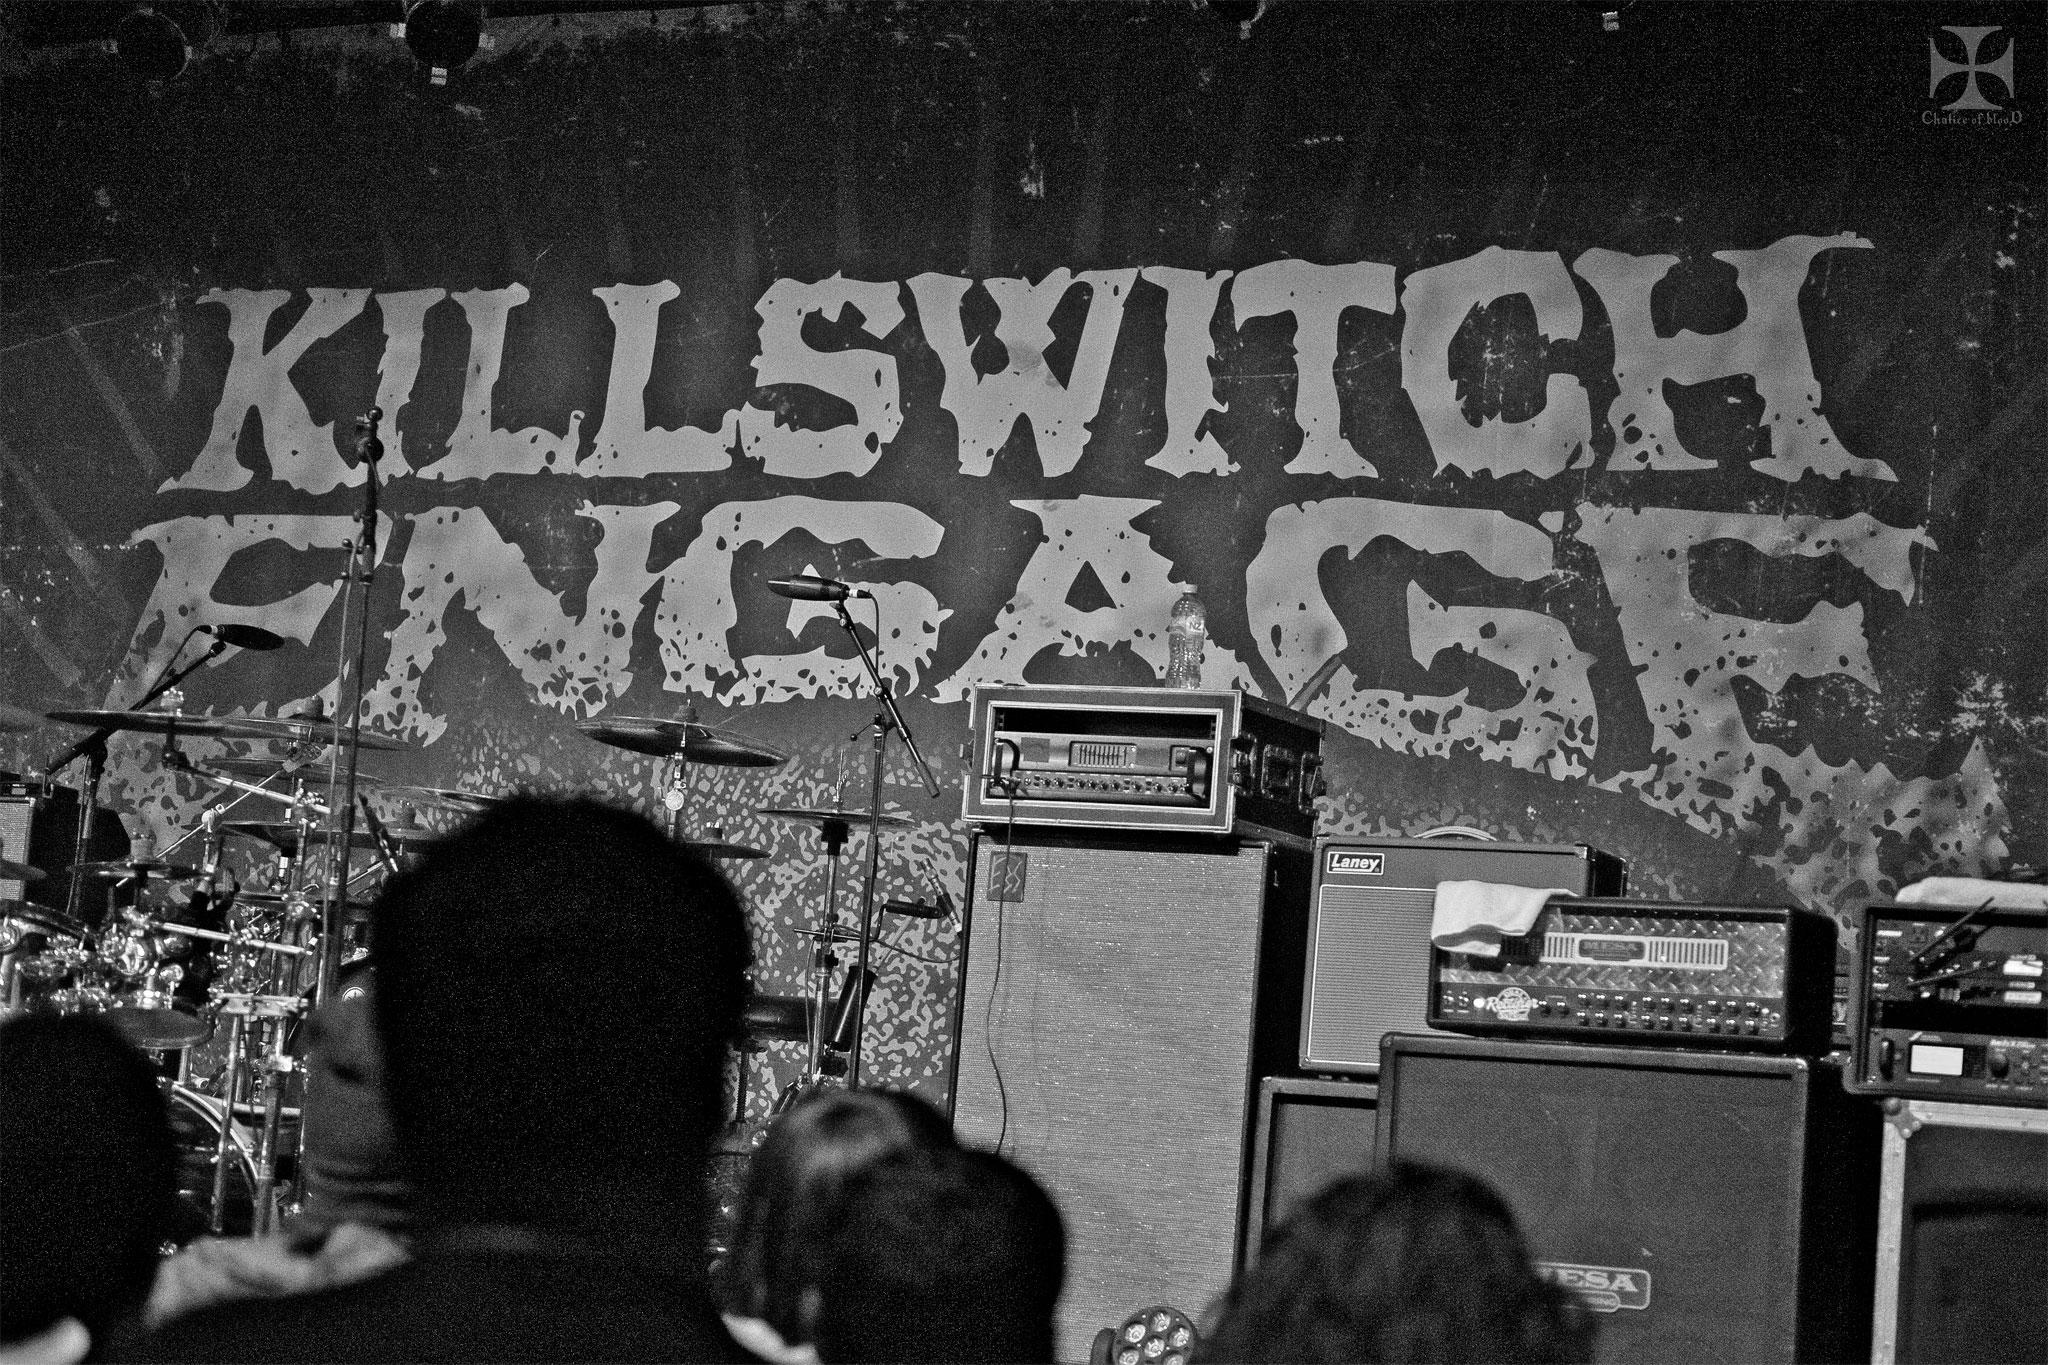 Killswitch-Engage---4-watermarked.jpg